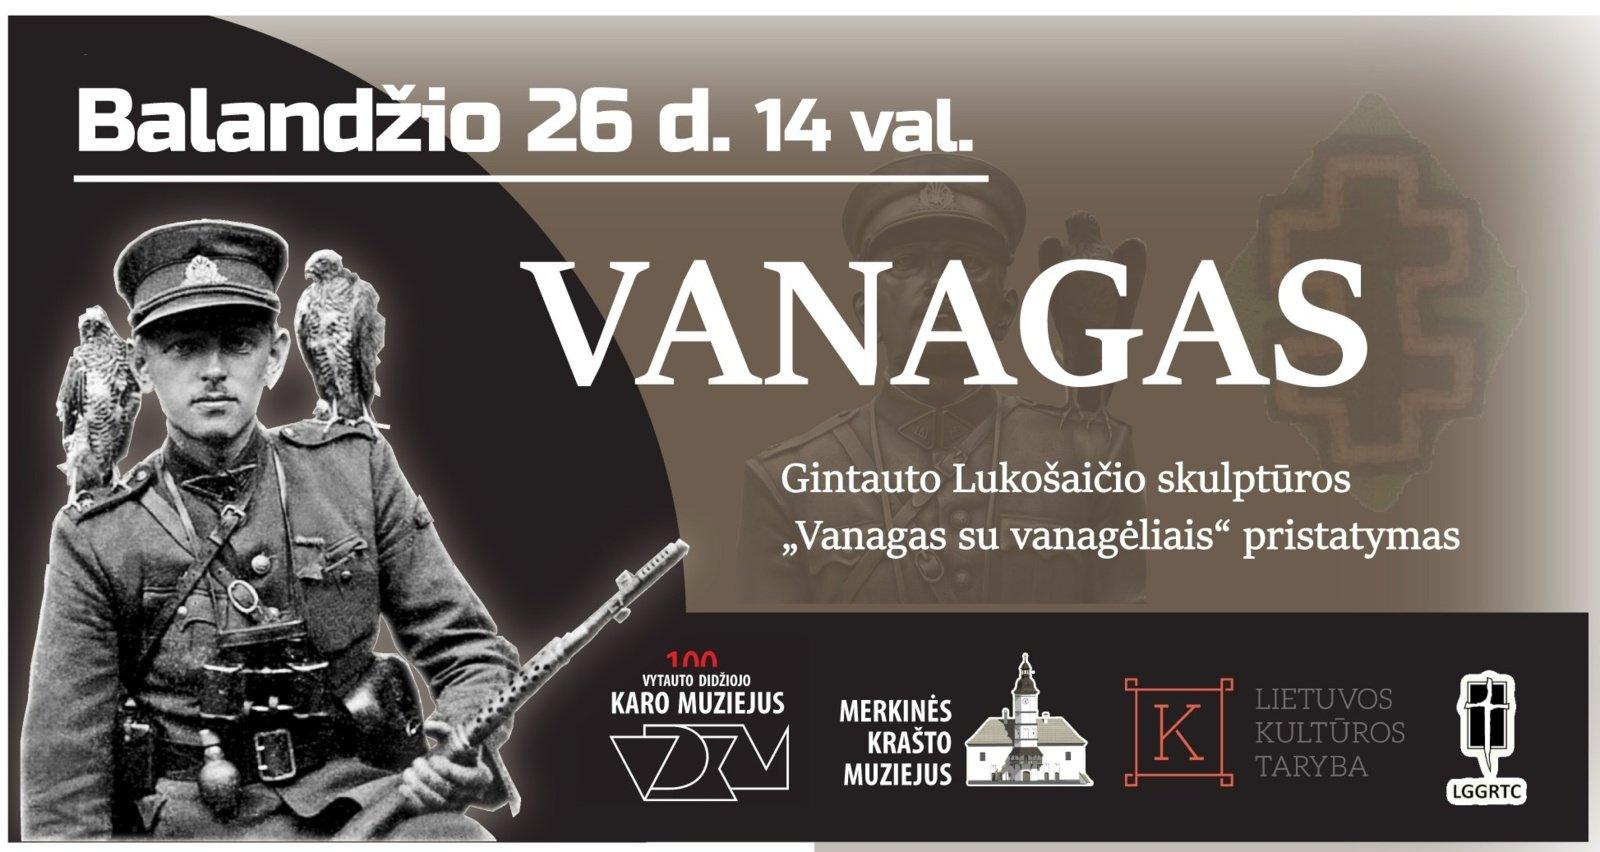 Kaune bus pristatyta skulptūra partizanų vadui A. Ramanauskui-Vanagui